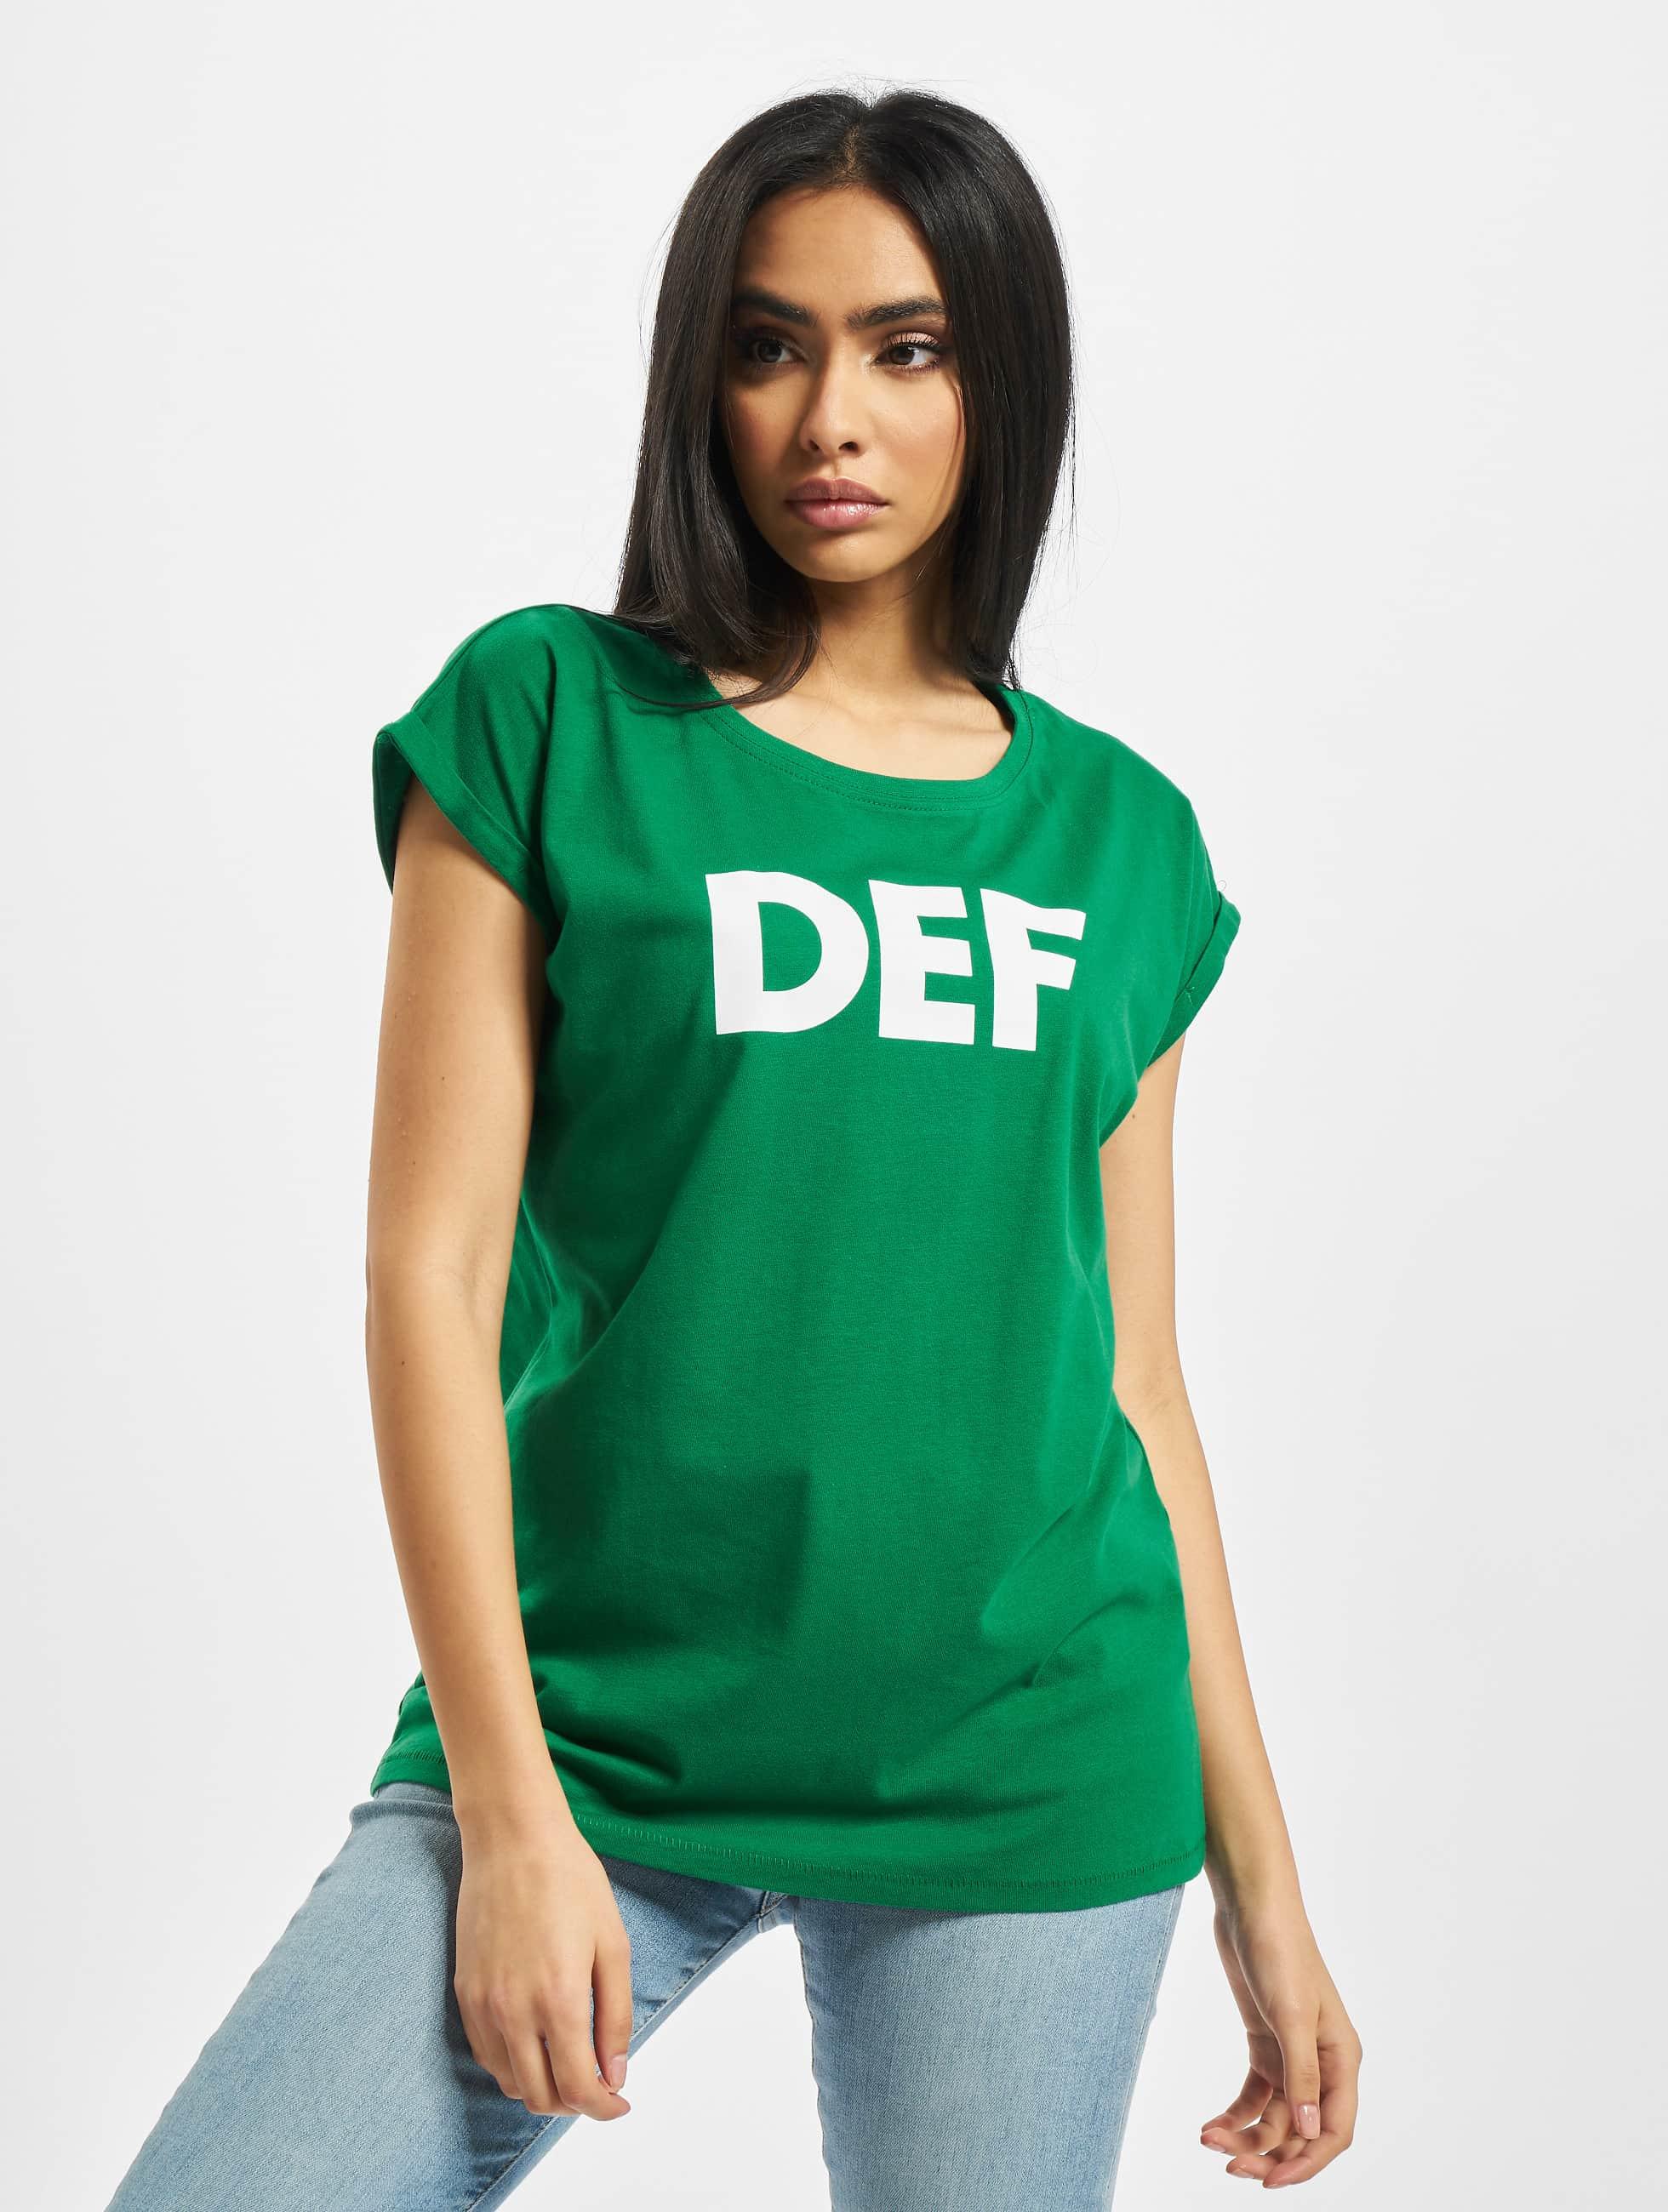 DEF / T-Shirt Sizza in green XS